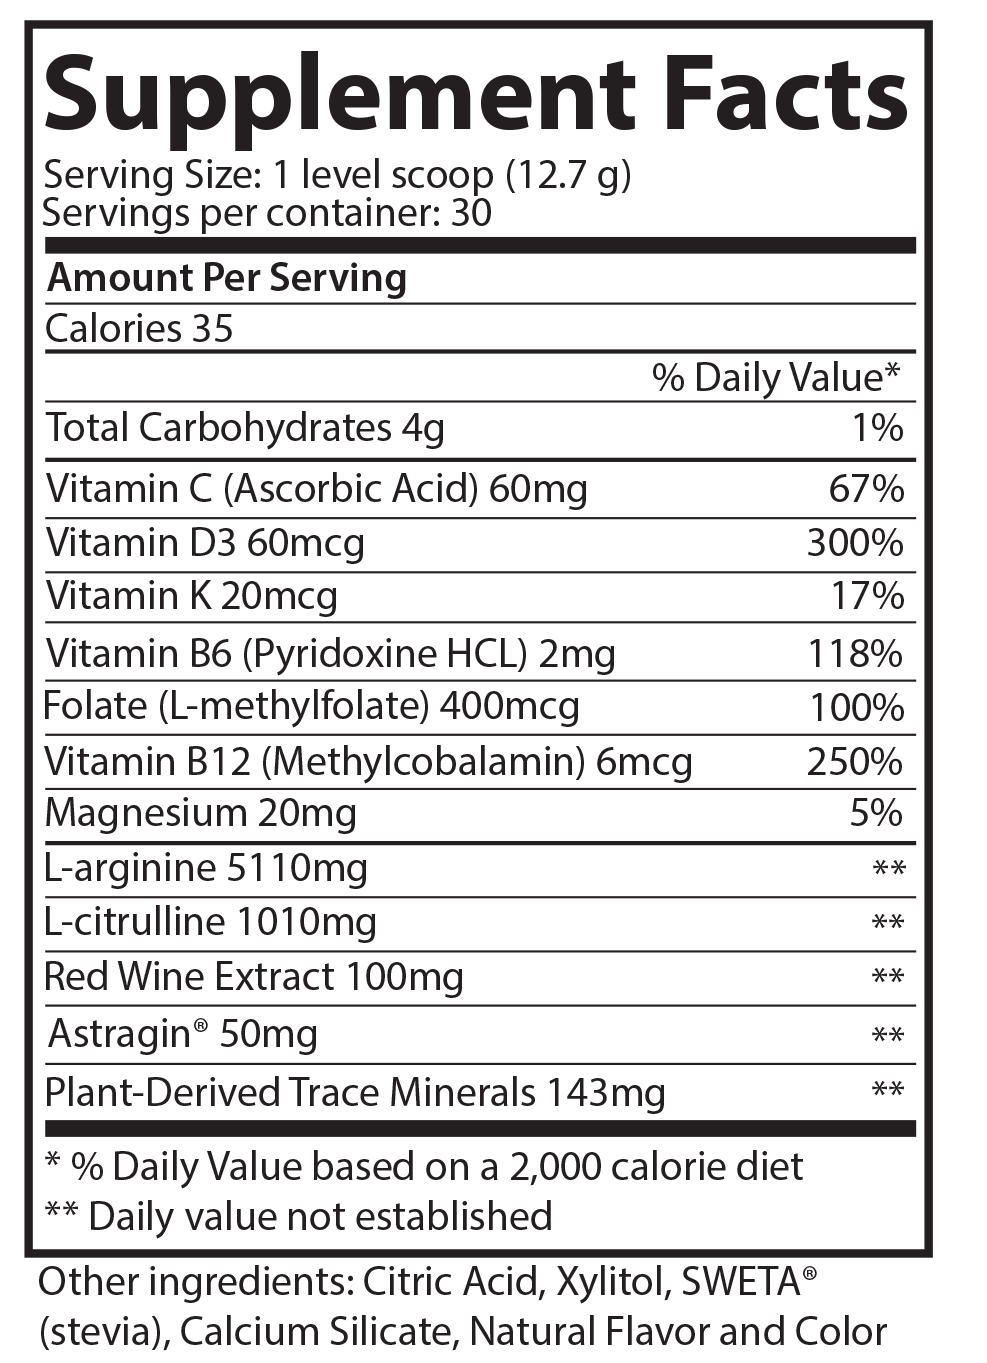 L-arginine Plus Supplement Facts